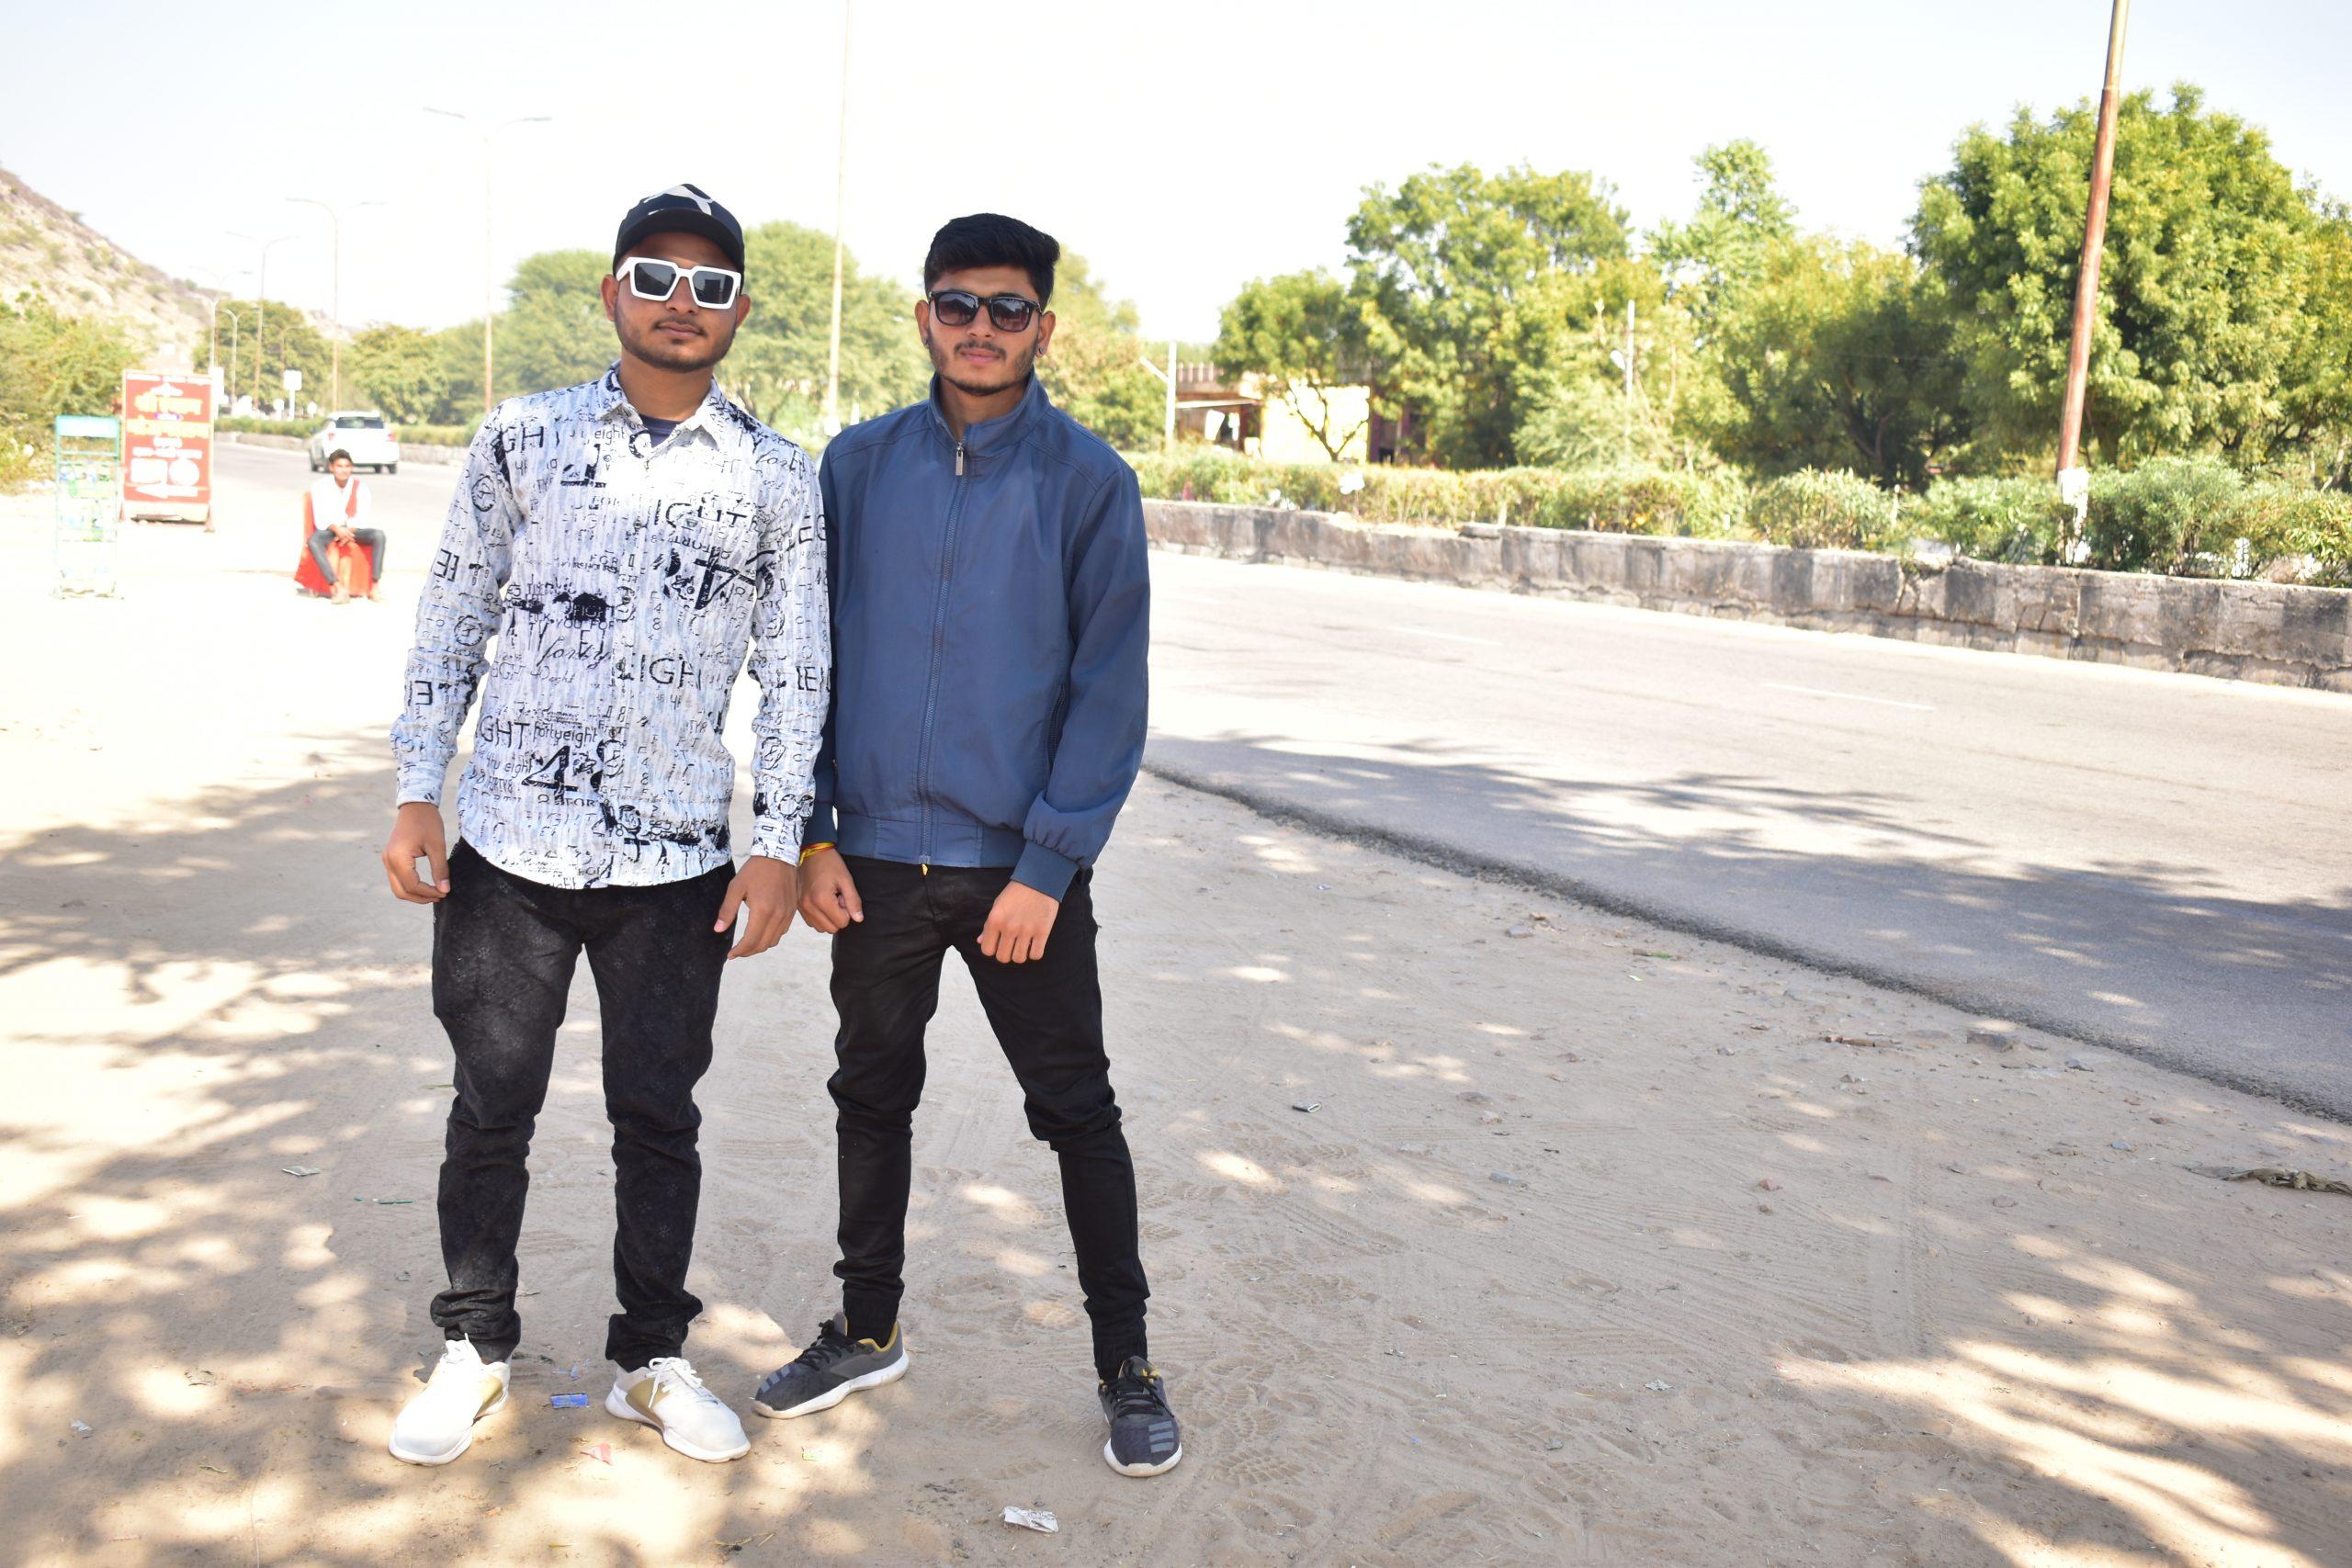 Boys posing on road